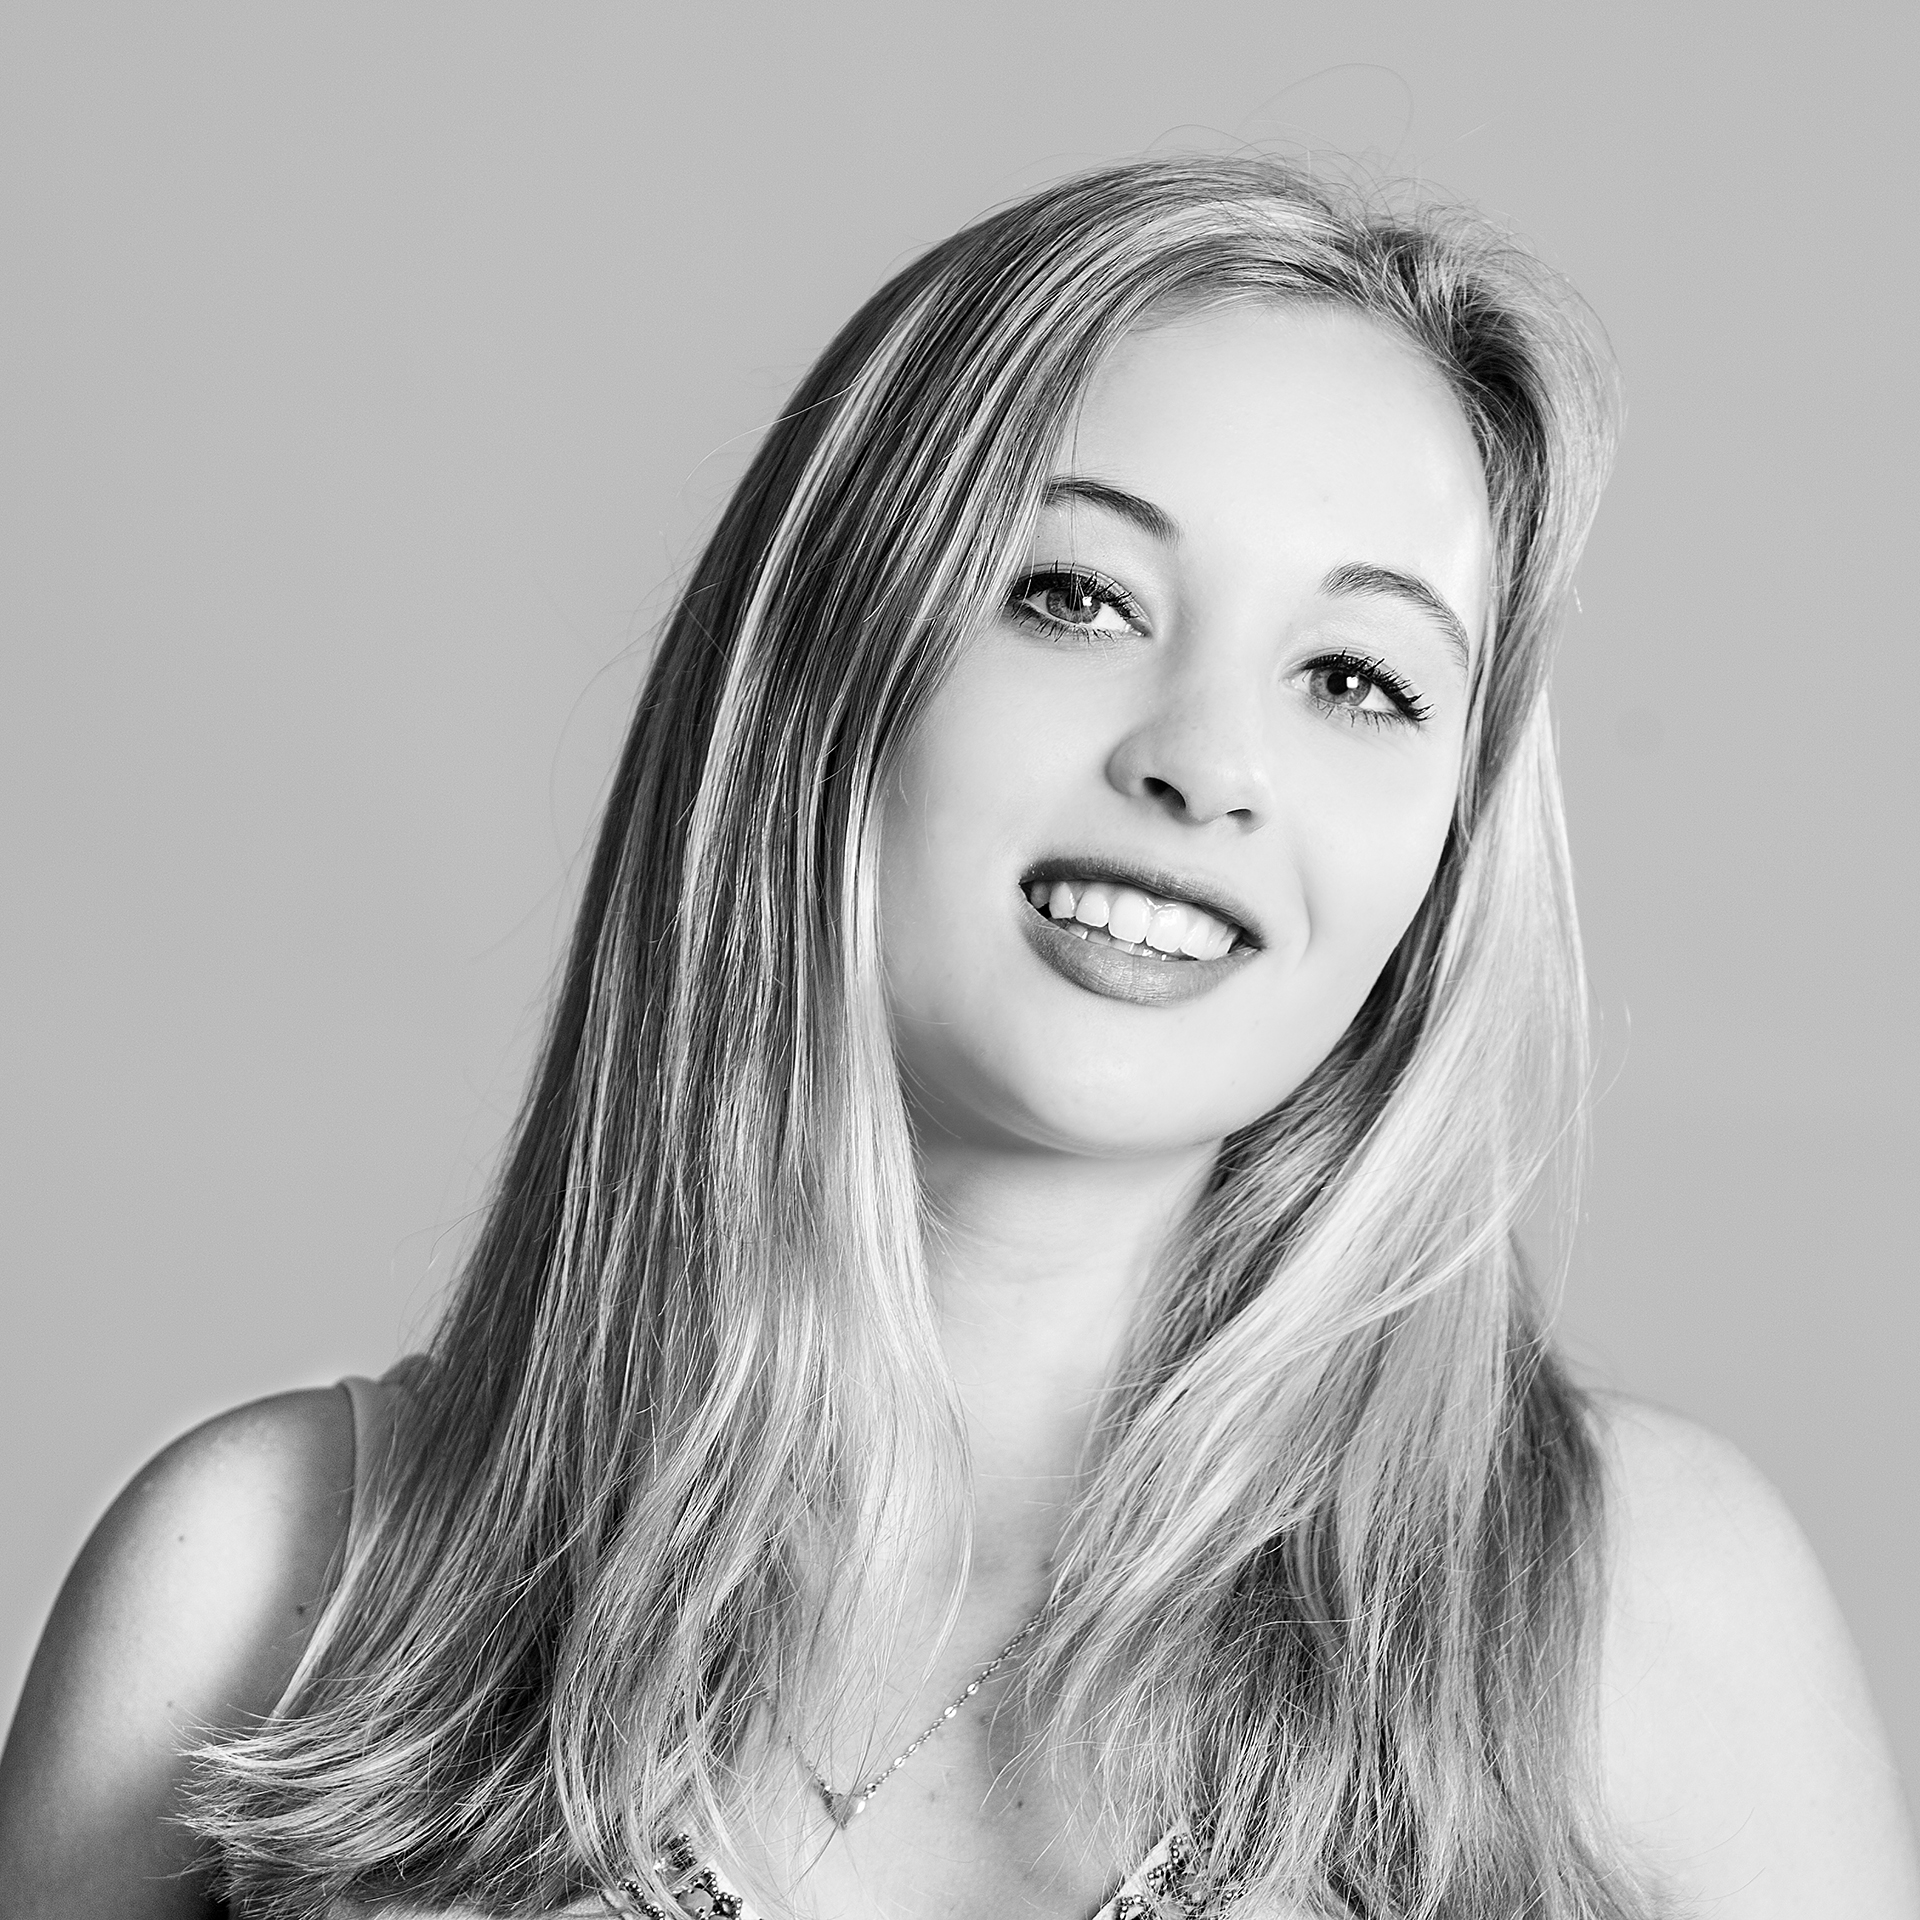 Vicky-Beck-boximages-sint-michielsgestel-gemonde-den-bosch-den-dungen-boxtel-berlicum-fotograaf-profielfoto-portretfoto-bedrijfsfoto